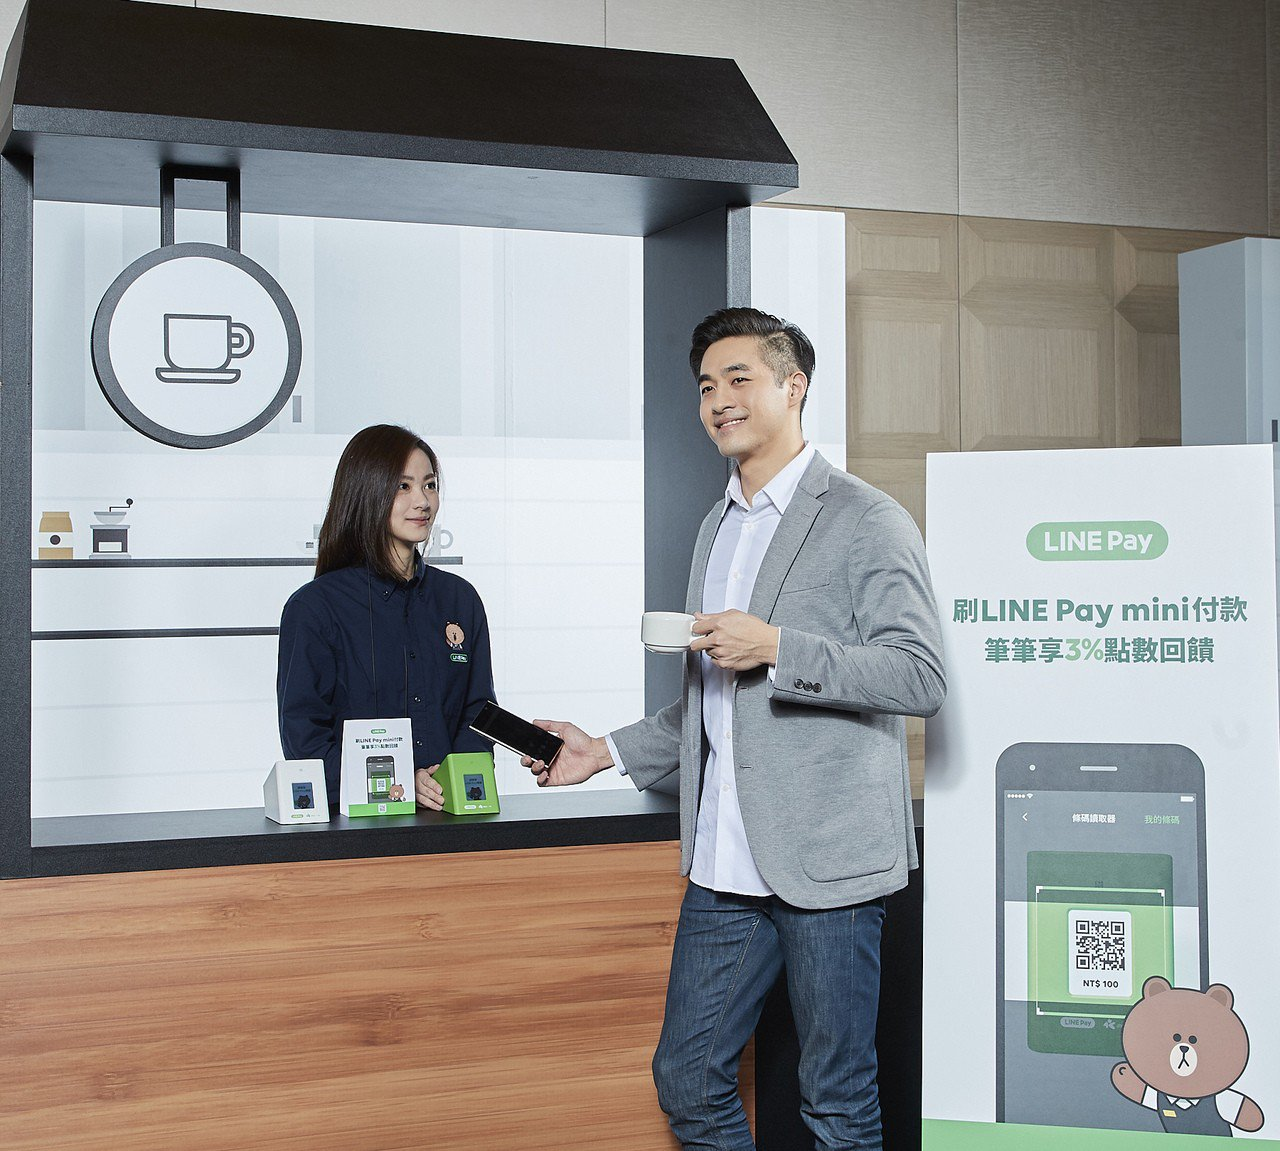 LINE Pay mini行動支付收款機支援LINE Pay綁定信用卡、LINE...